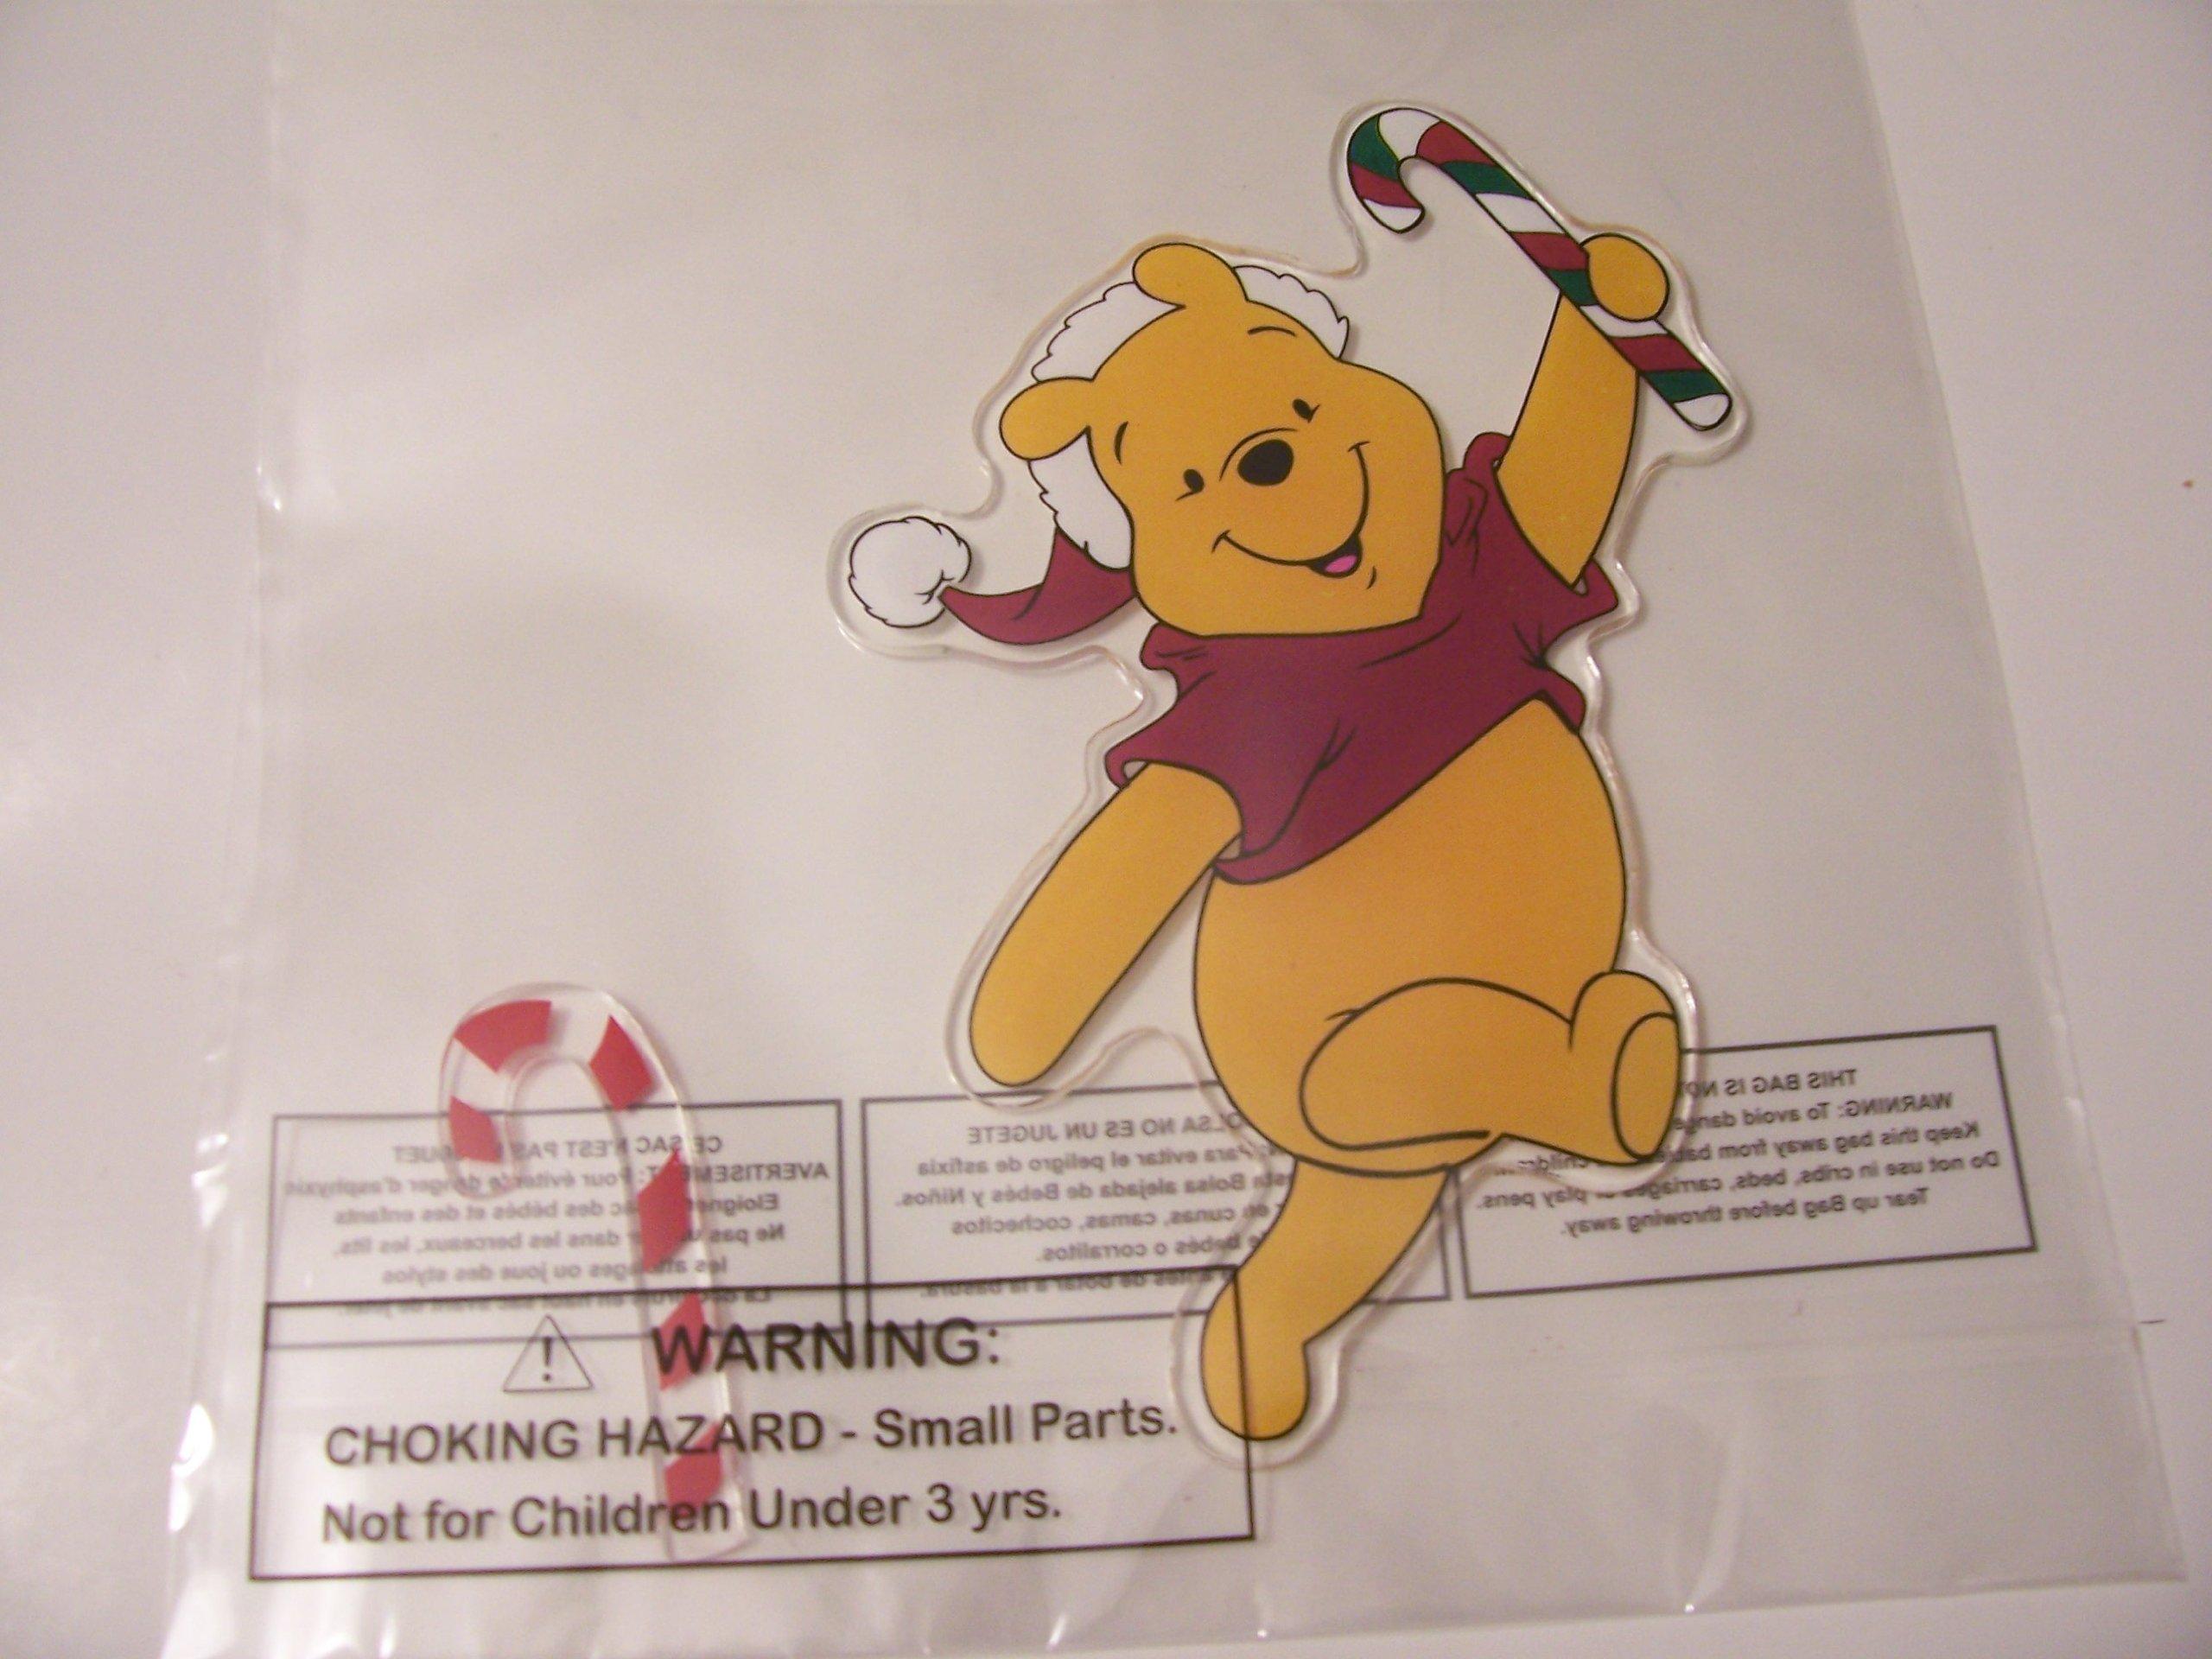 Disney Winnie the Pooh Jelz Christmas Window Gel Clings ~ Santa Pooh with Candycanes (2 Clings)